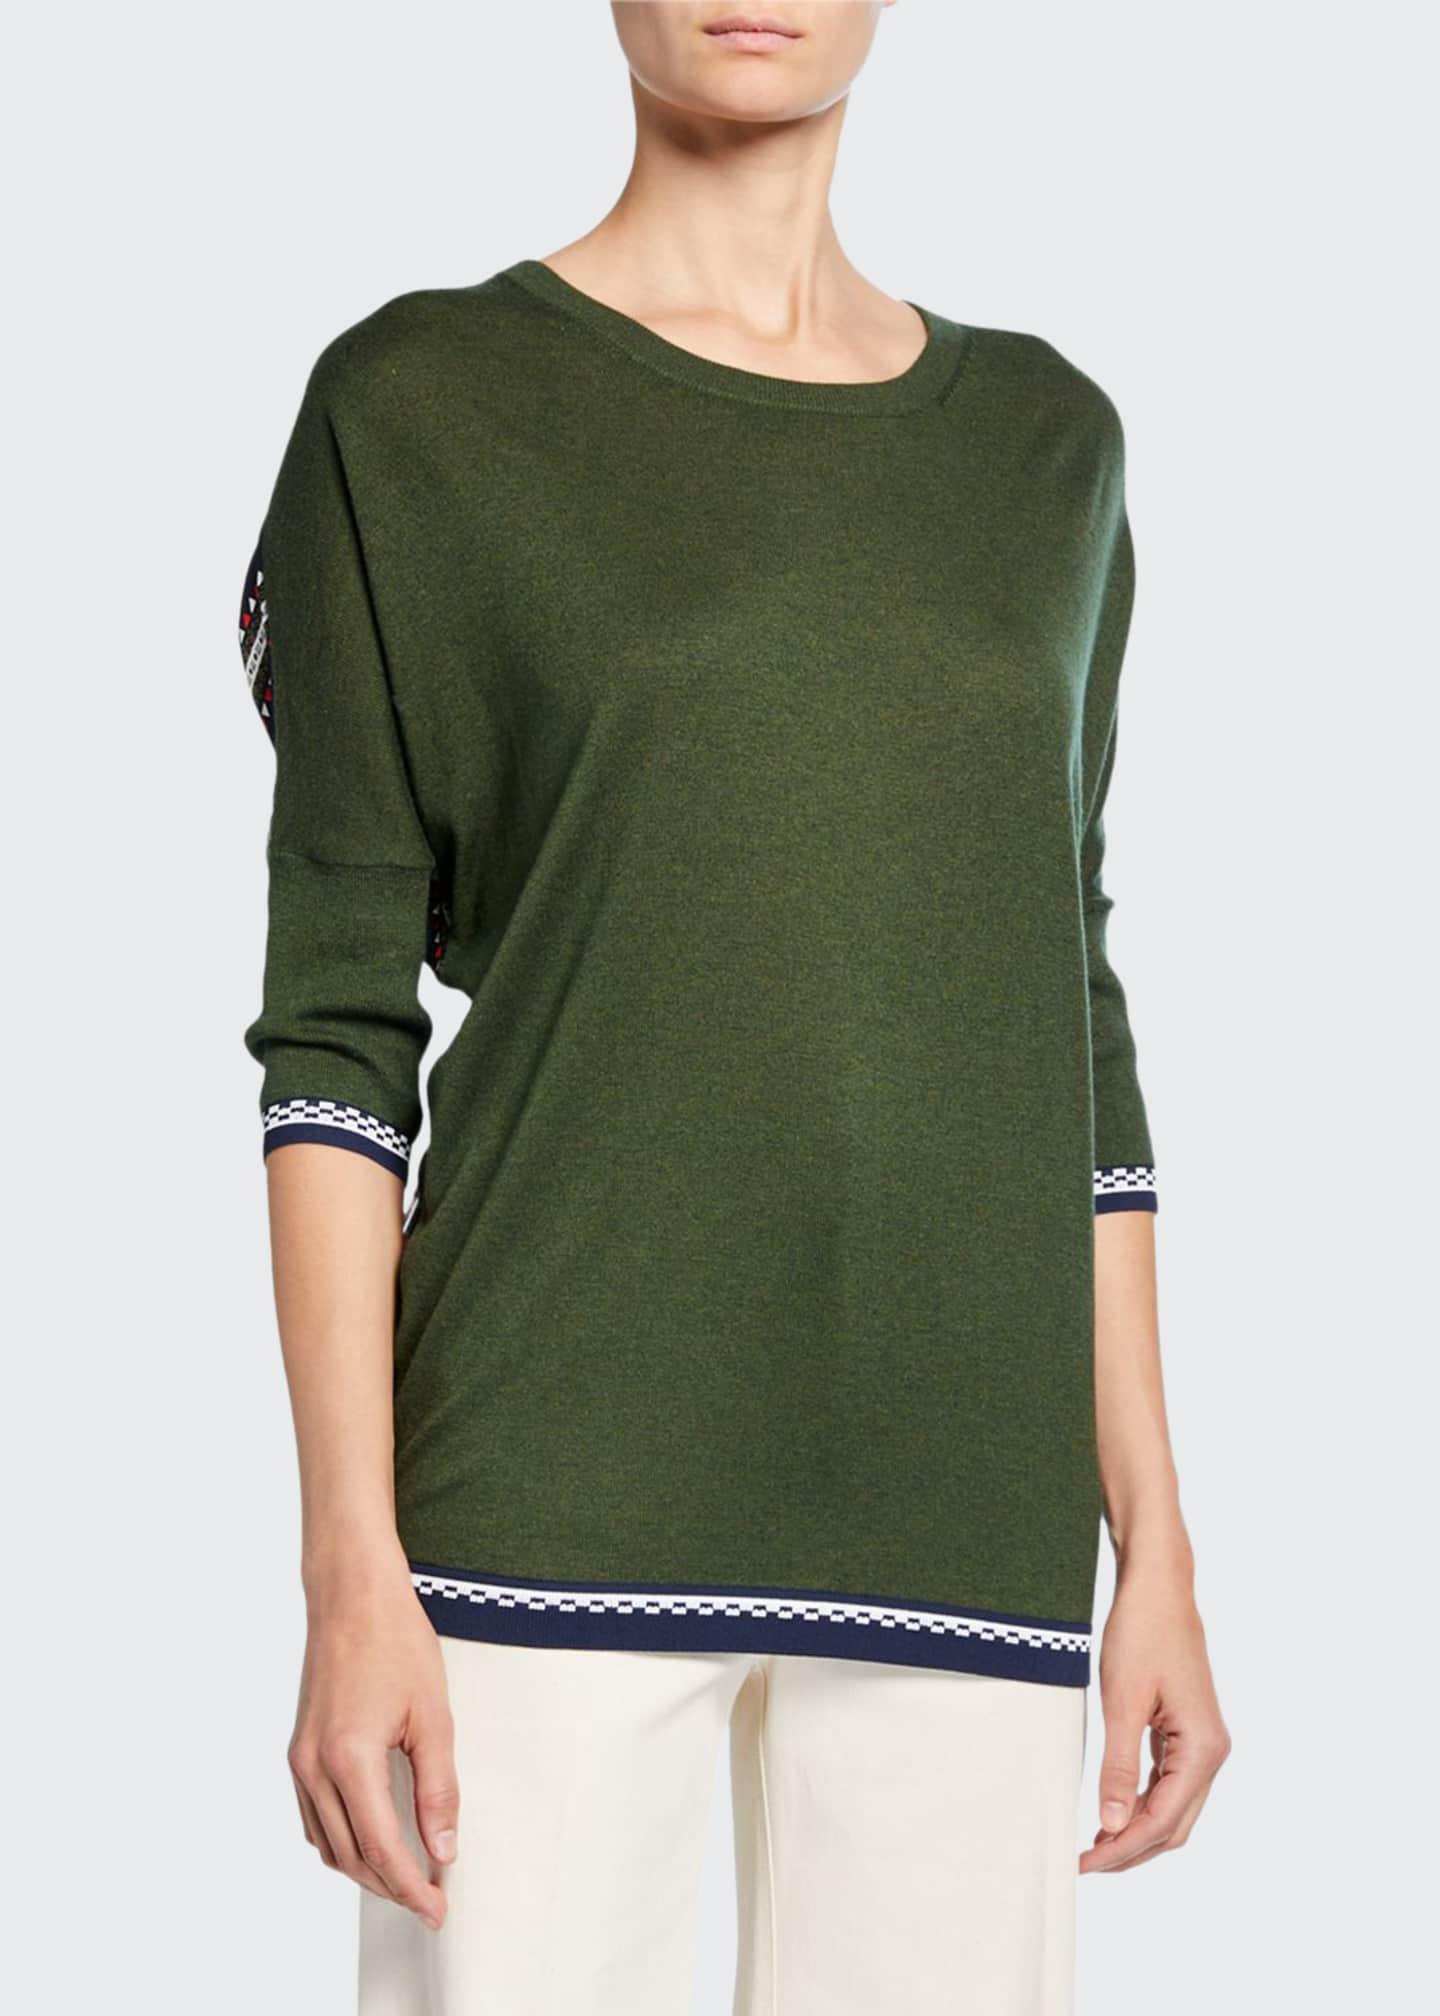 Derek Lam Striped Chiffon-Back Crewneck Sweater